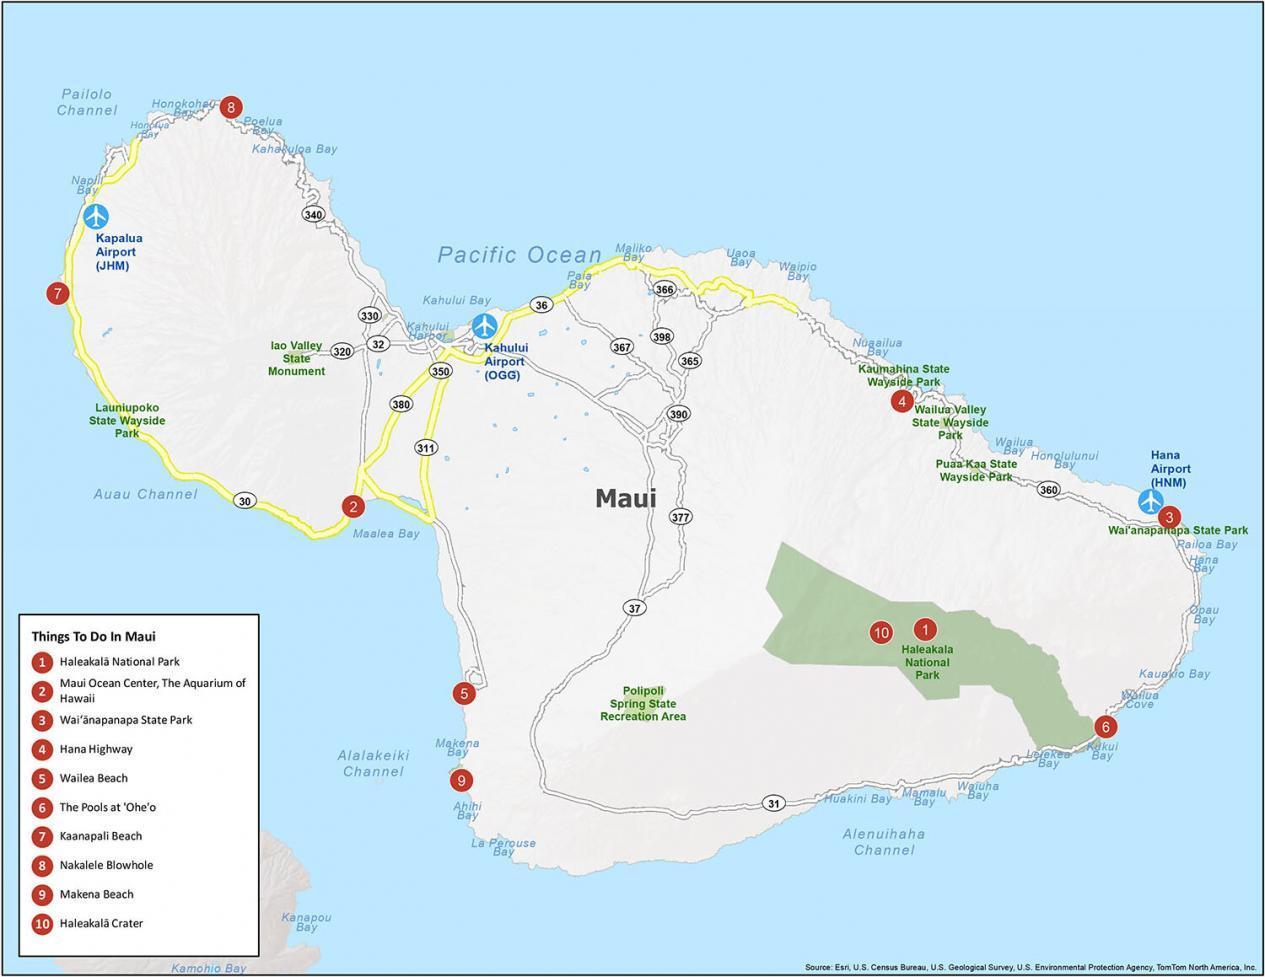 Maui Things To Do